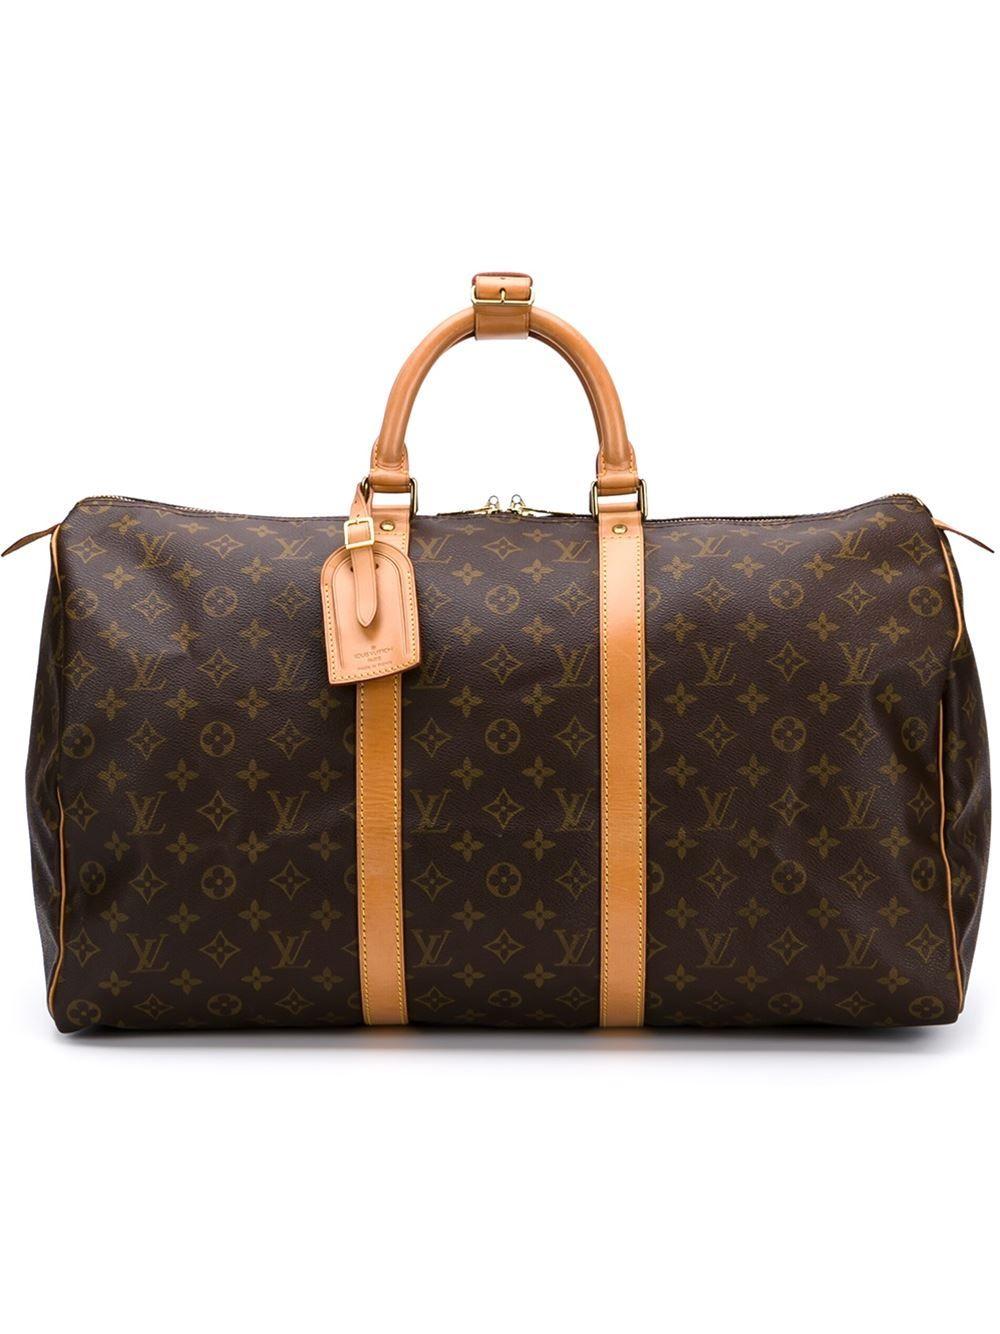 Louis Vuitton Vintage Keepall Bag 50cm Louis Vuitton Holdall Louis Vuitton Louis Vuitton Handbags